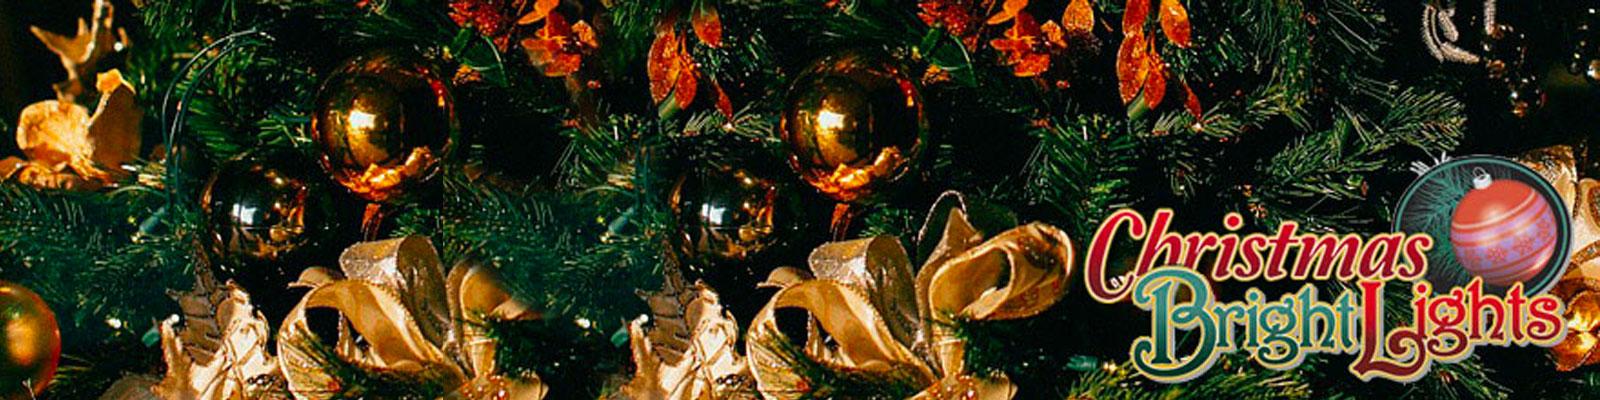 Commercial Christmas & Holiday Light Installation Naples, FL | Naples Landscape Lighting